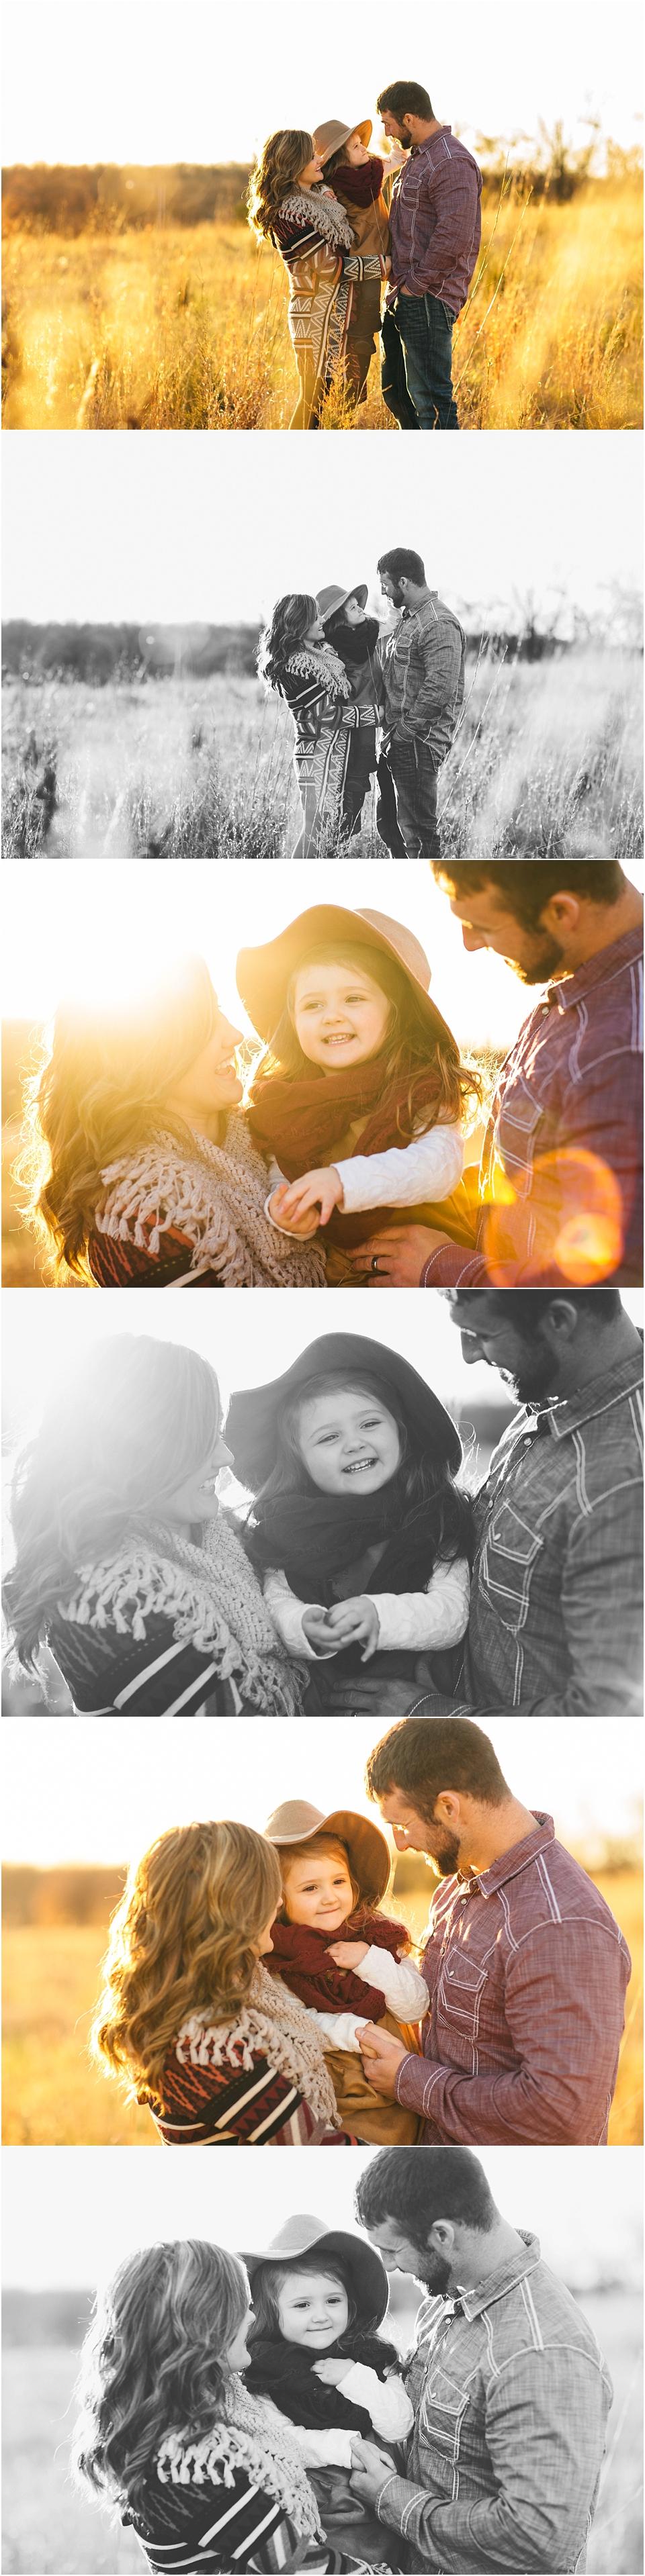 kansascityfamilyphotographer_0020